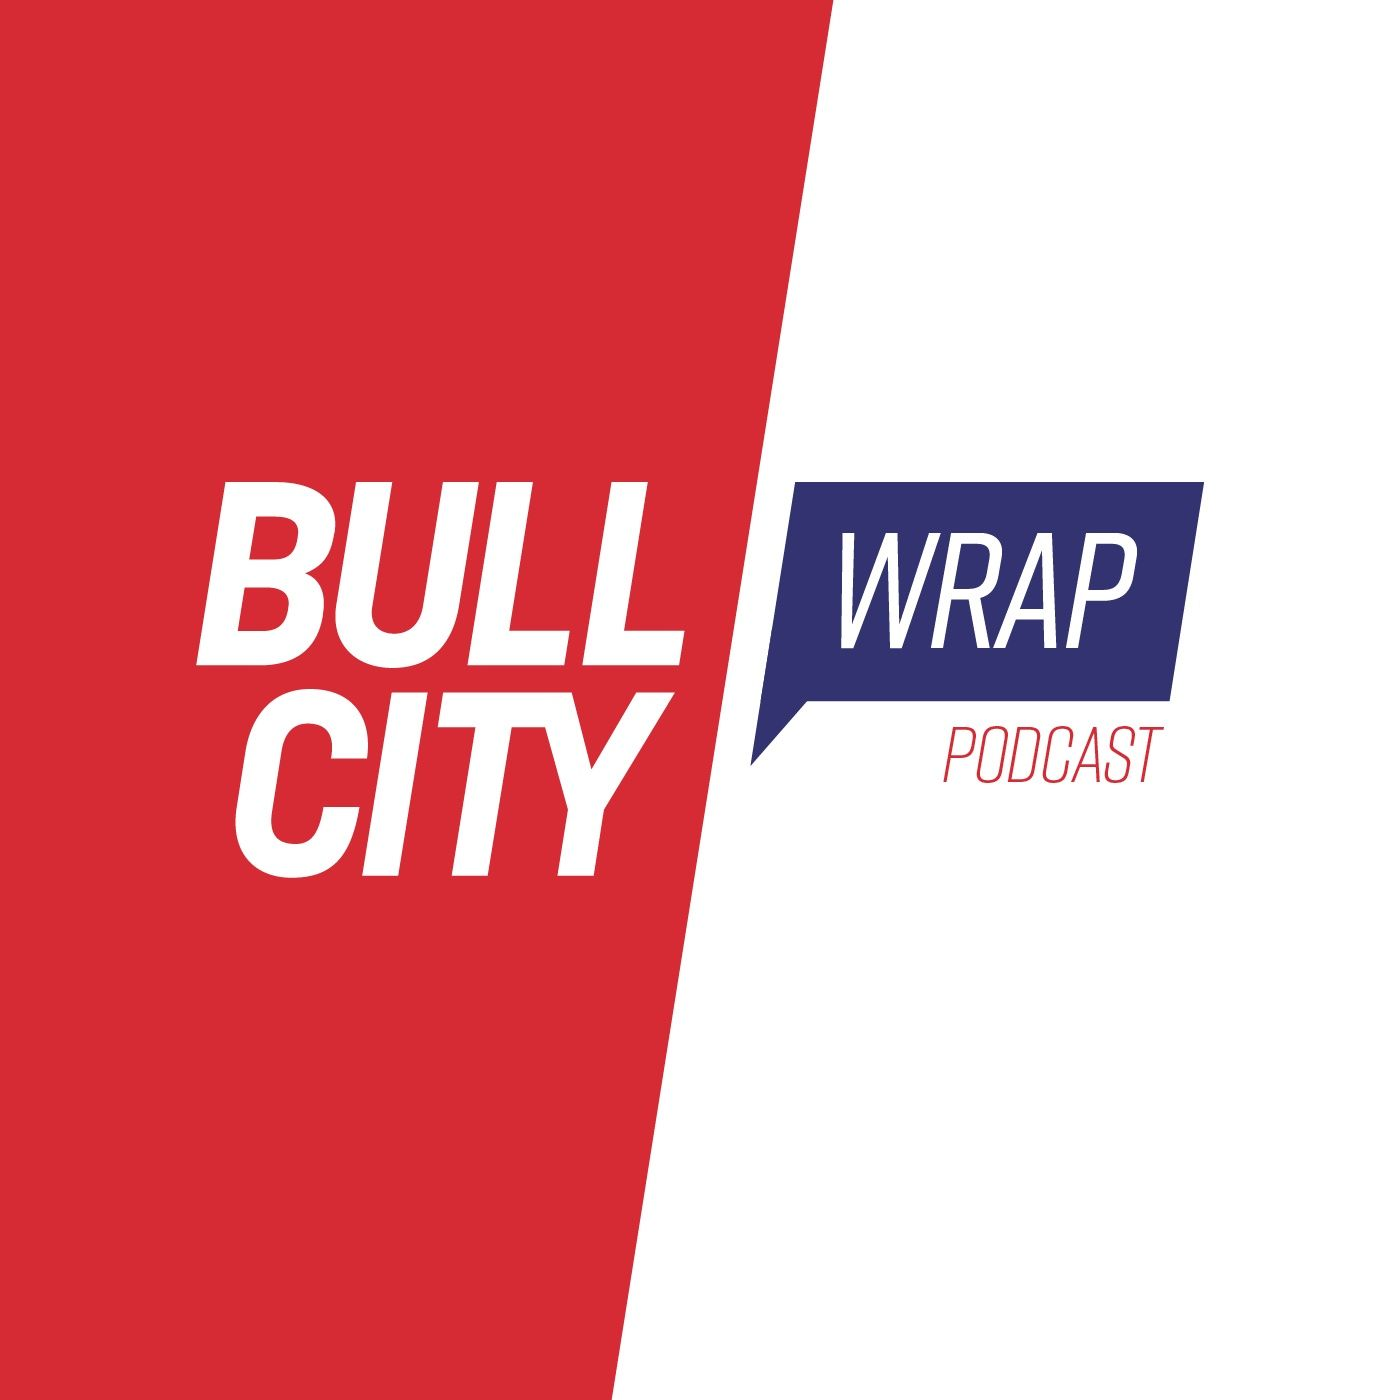 Bull City Wrap ep. 238 (Oct. 12 - 18, 2021)